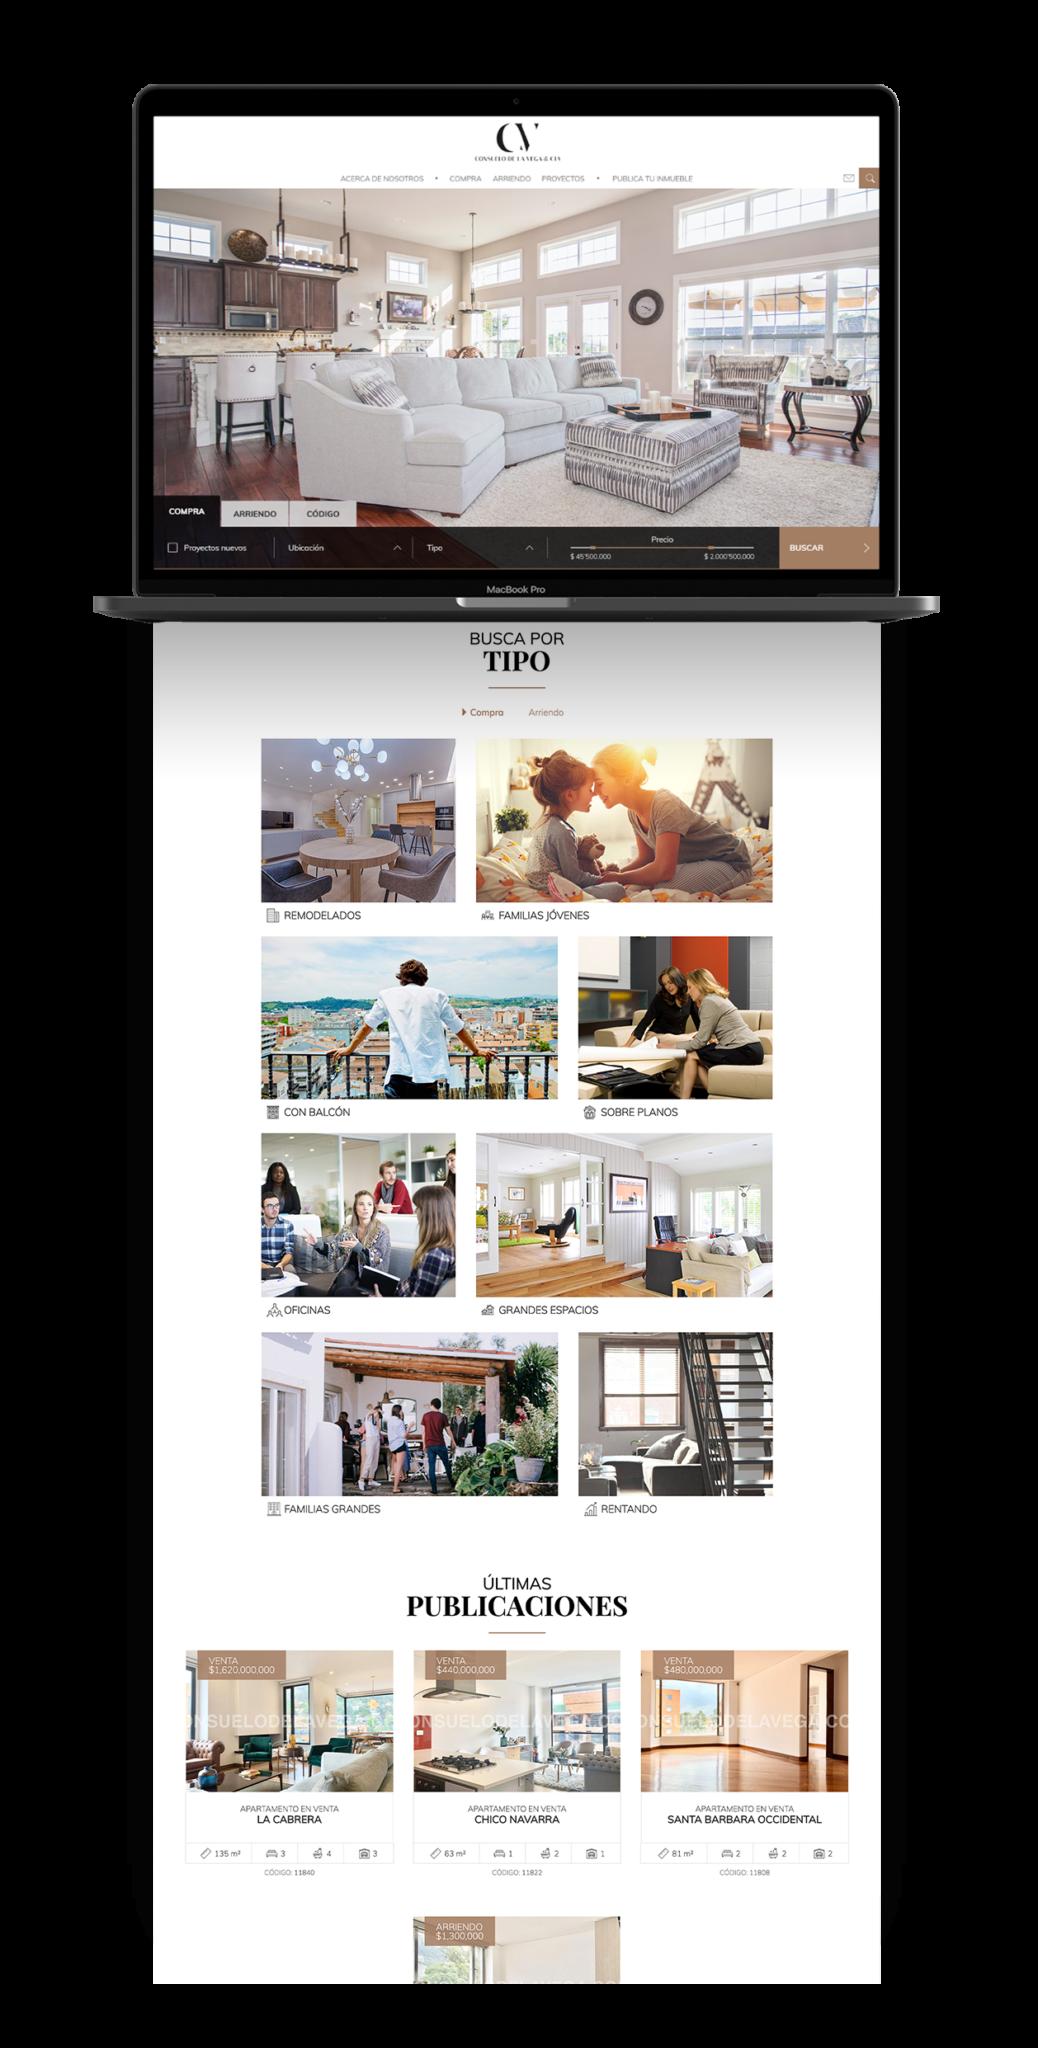 consuelo-de-la-vega-branding-website-real-estate-buying-rental